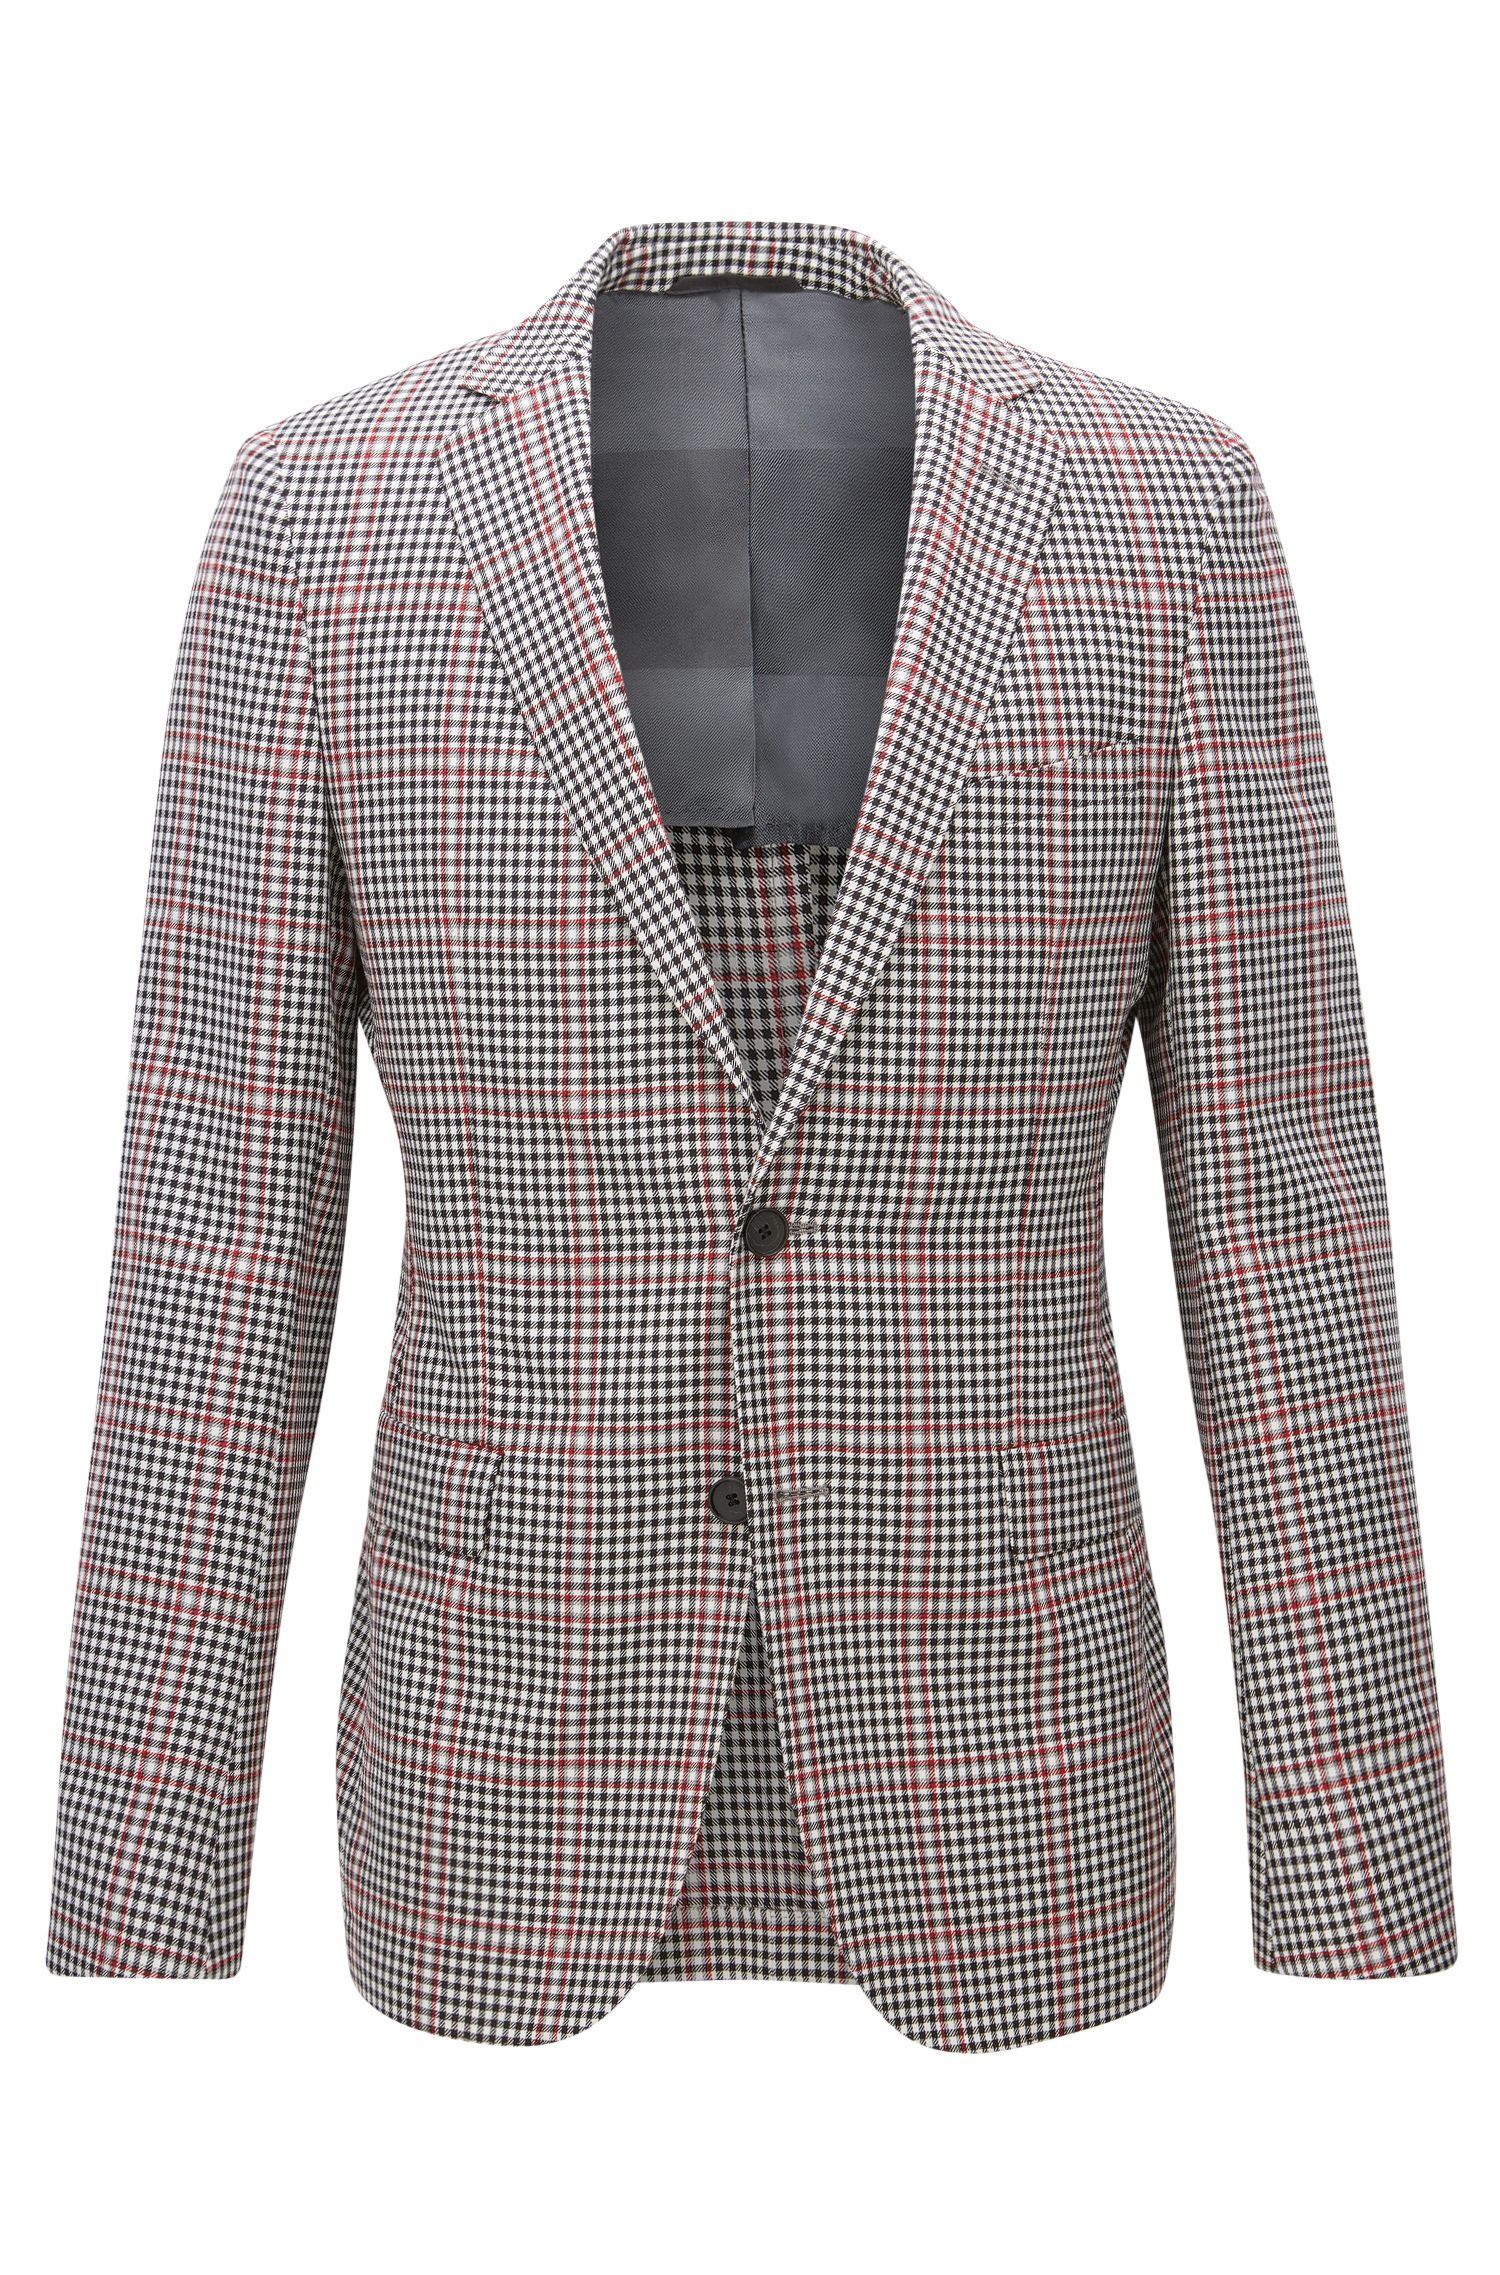 Windowpane Virgin Wool Sport Coat, Extra Slim Fit   Roan